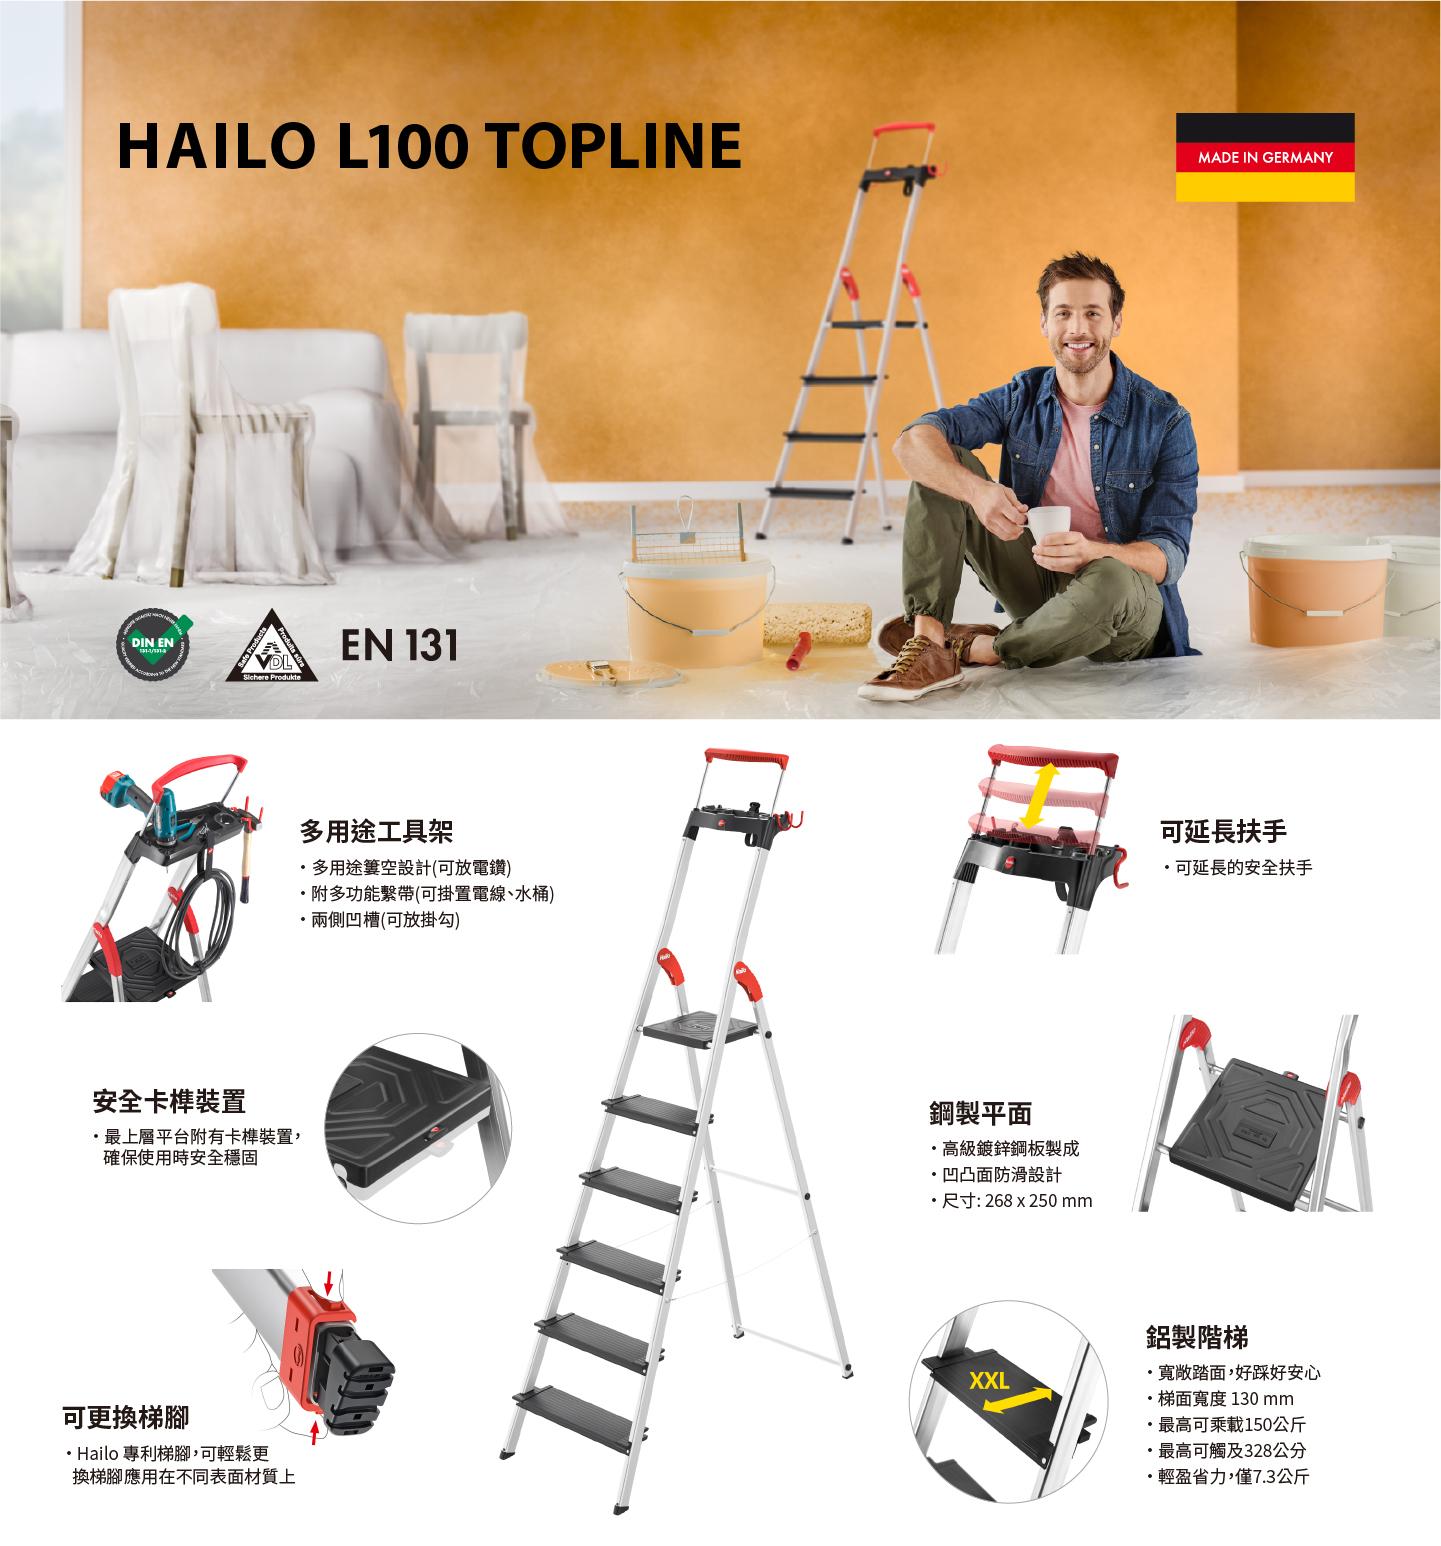 Hailo-L100Topline-6steps